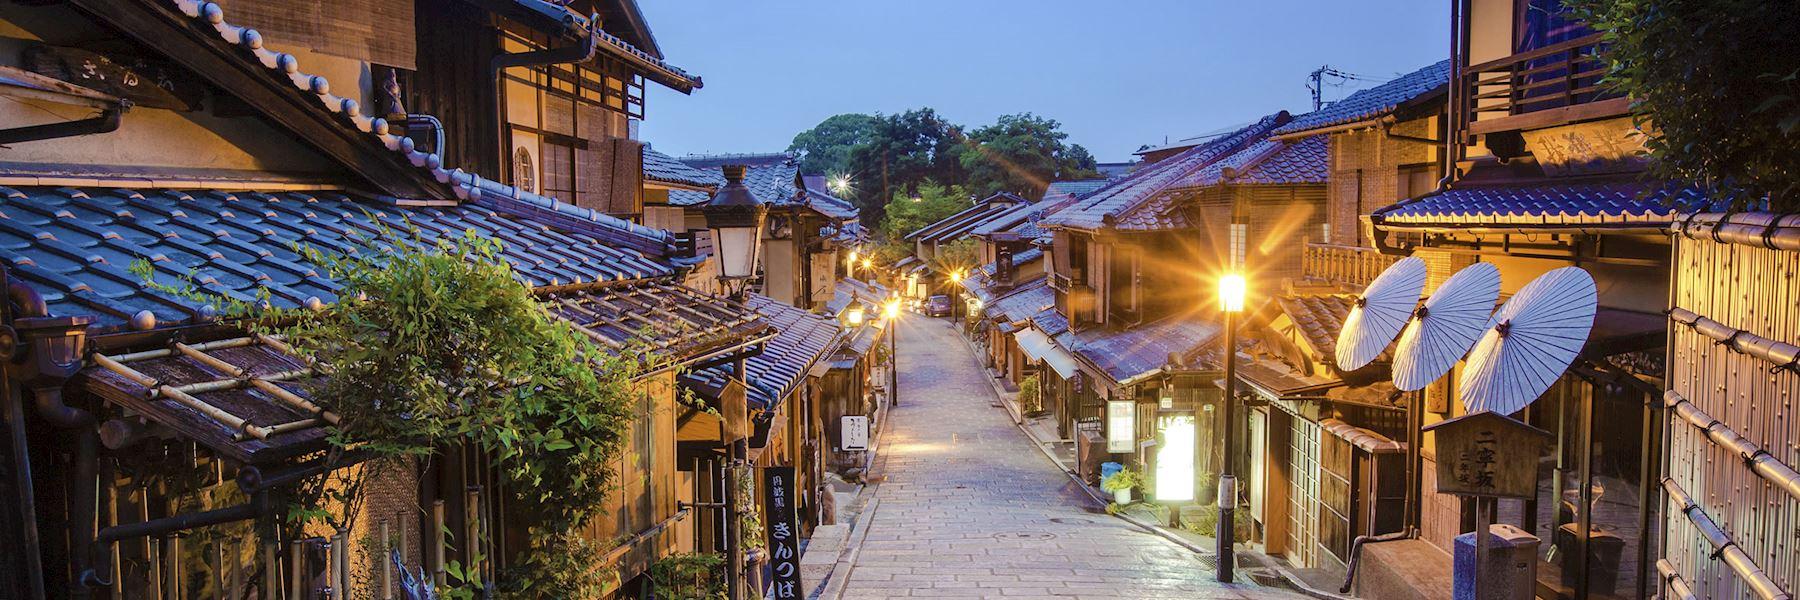 Visit Kyoto, Japan